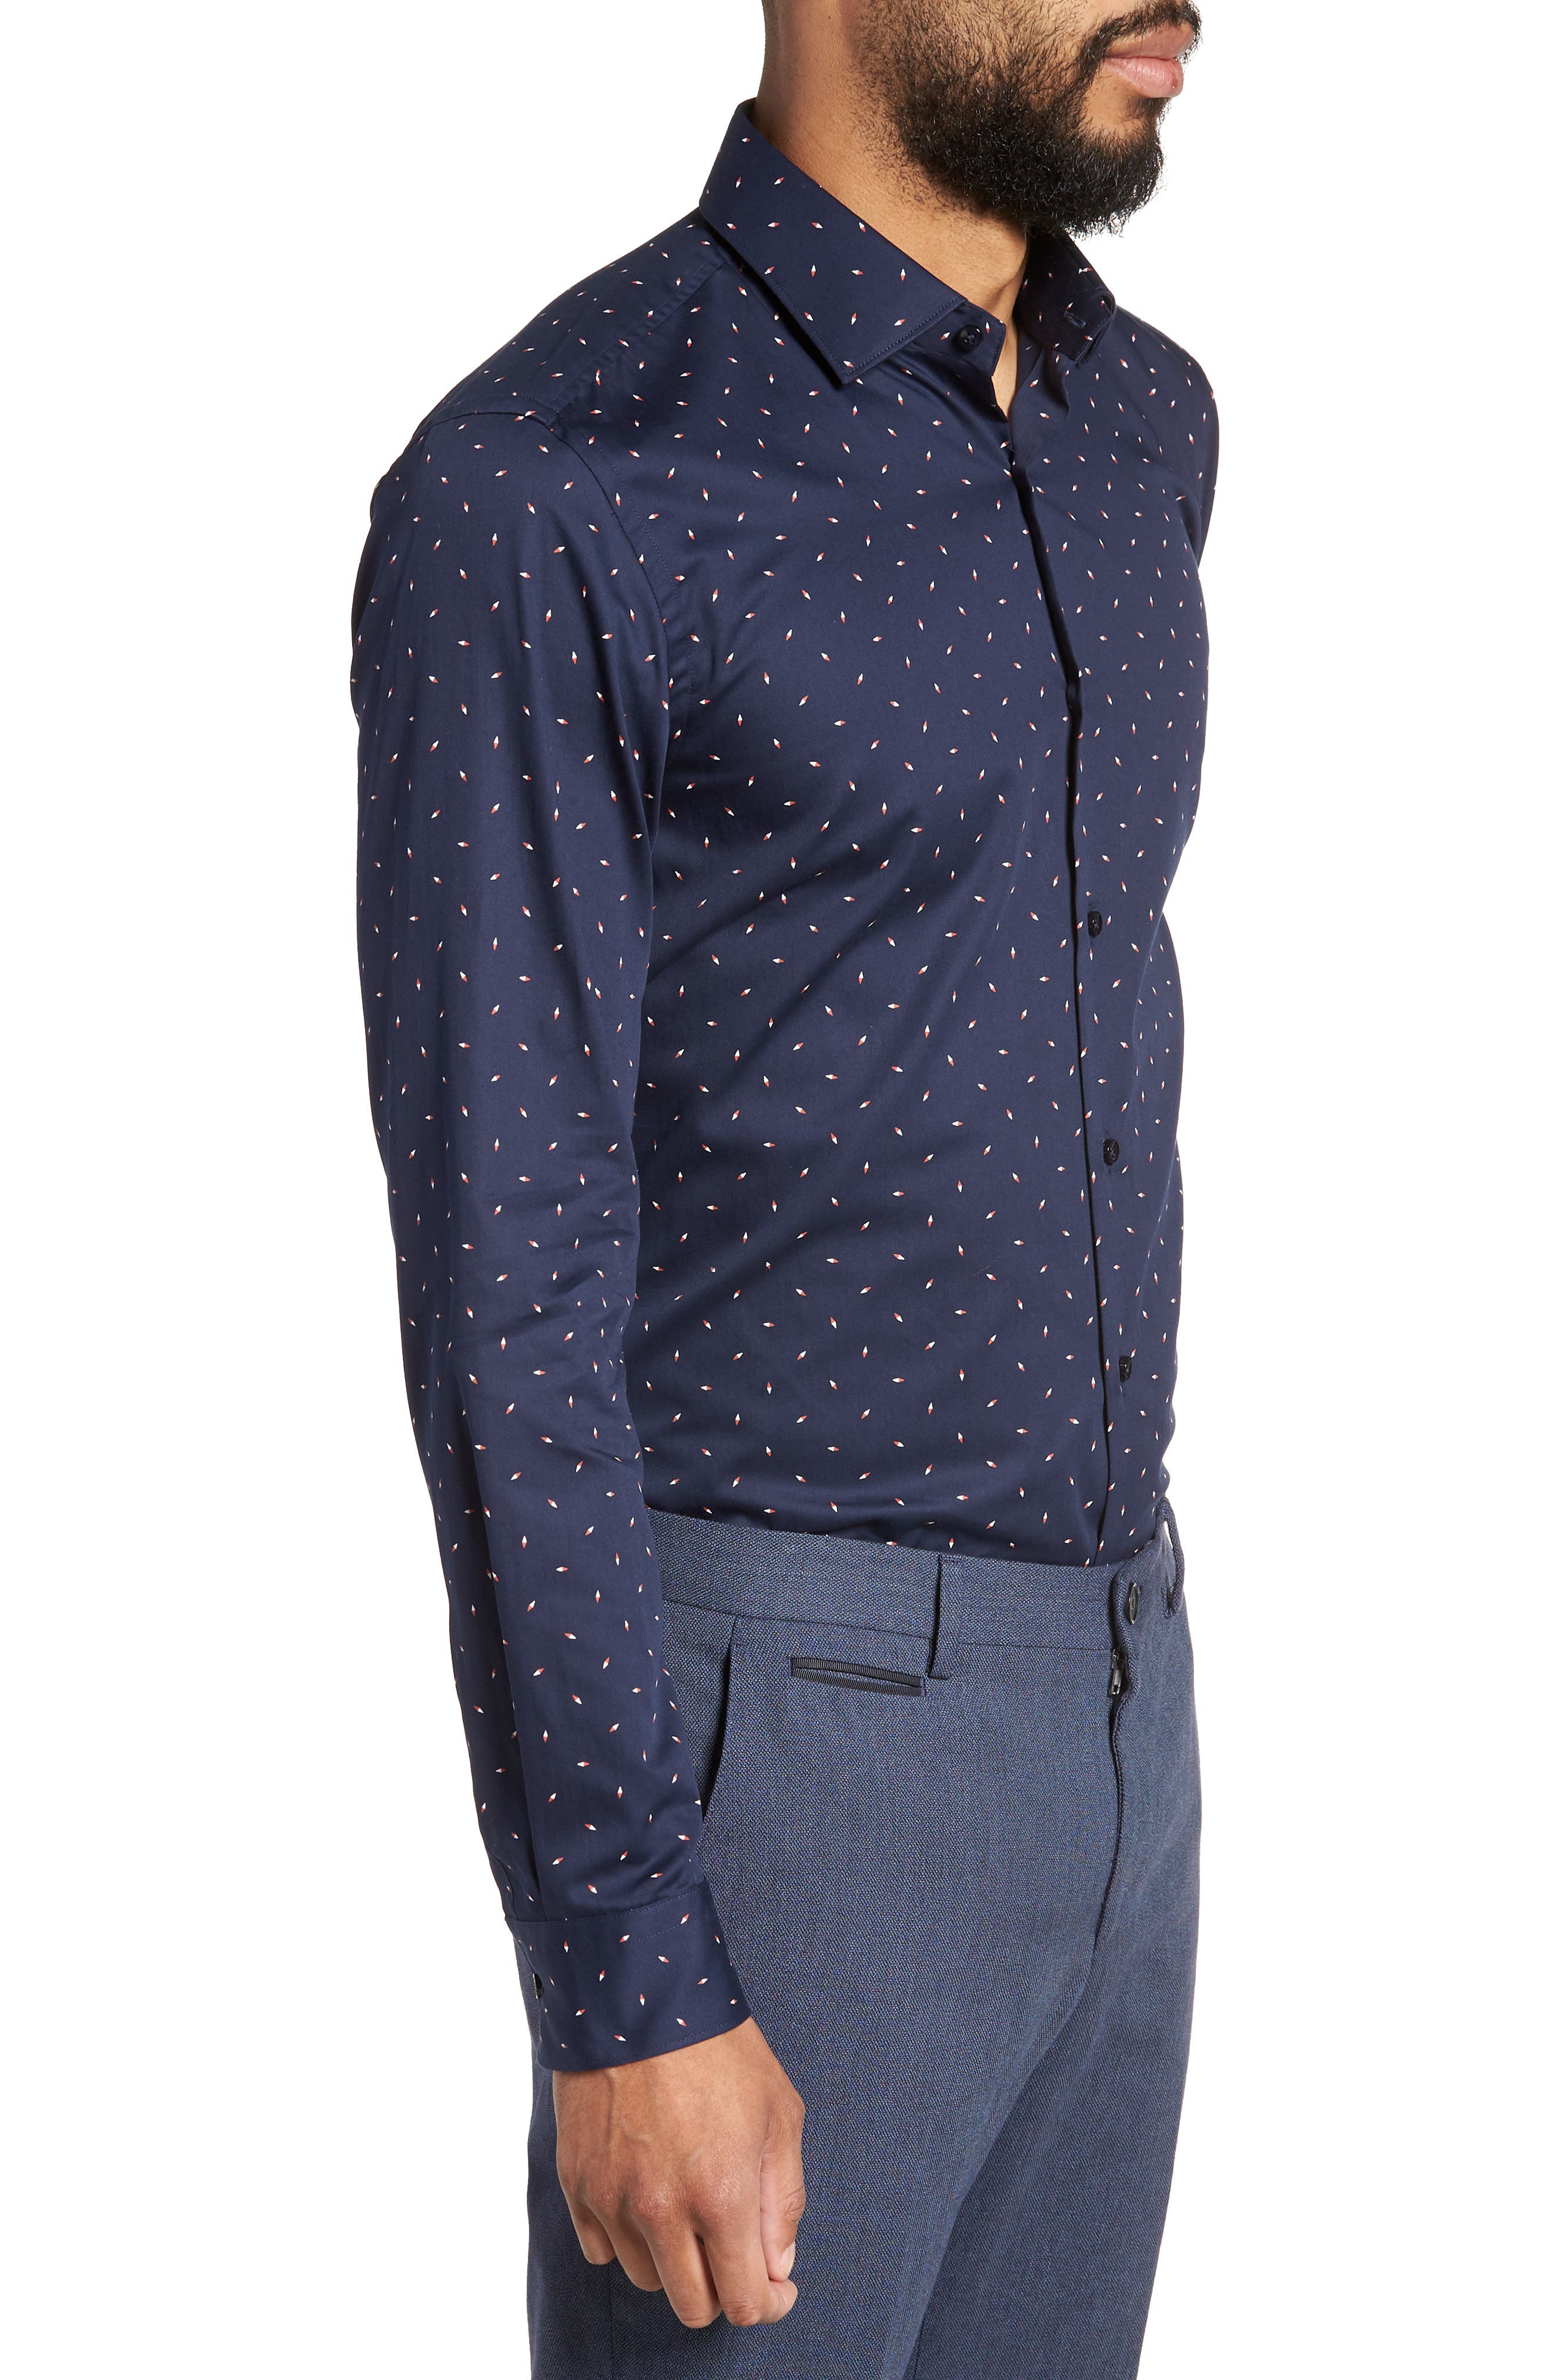 Ismo Slim Fit Print Dress Shirt,                             Alternate thumbnail 4, color,                             Navy